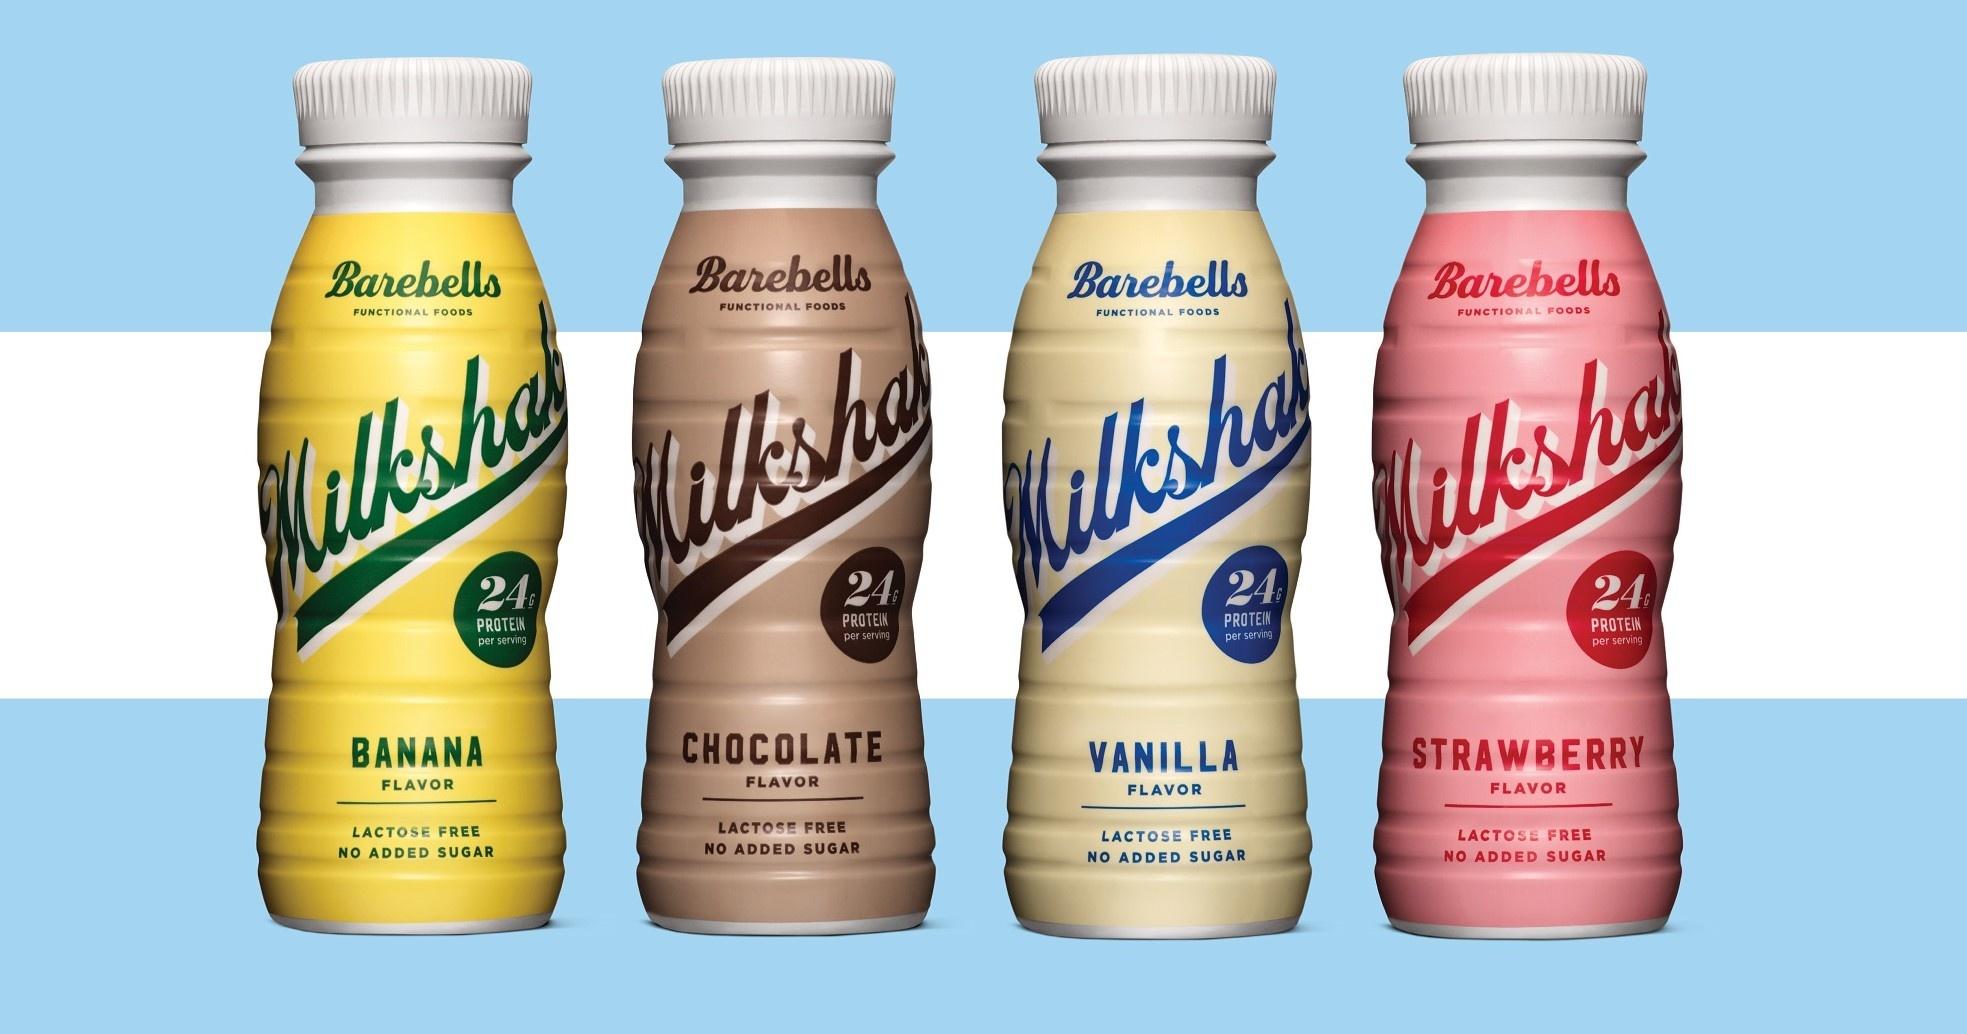 Barebells Eiwit Milkshake Real Nutrition Shop